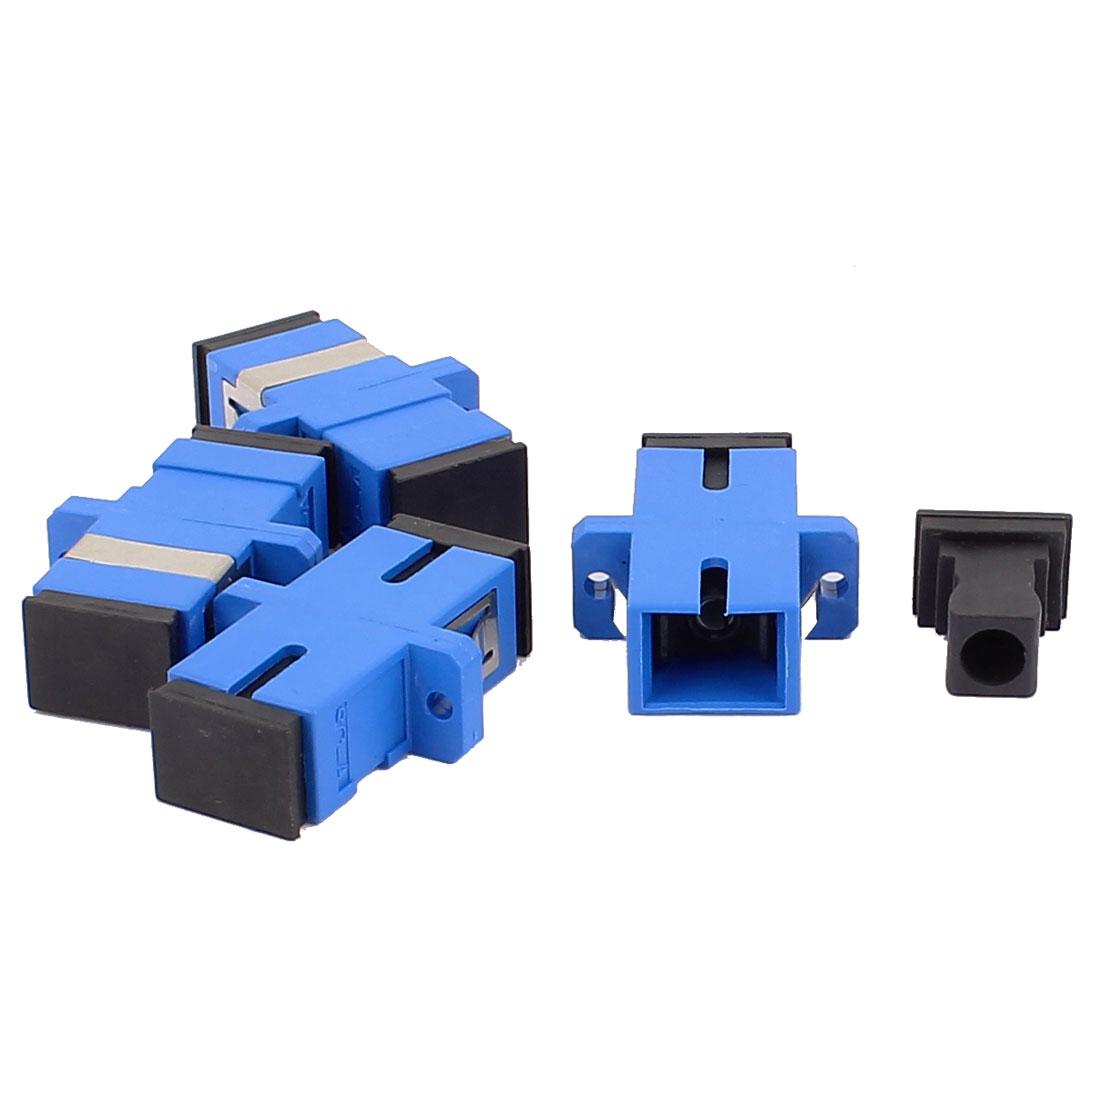 4 Pcs Multi-mode SC-SC UPC Simplex Fibre Couplers Flange Adapters Optical Fiber Connectors